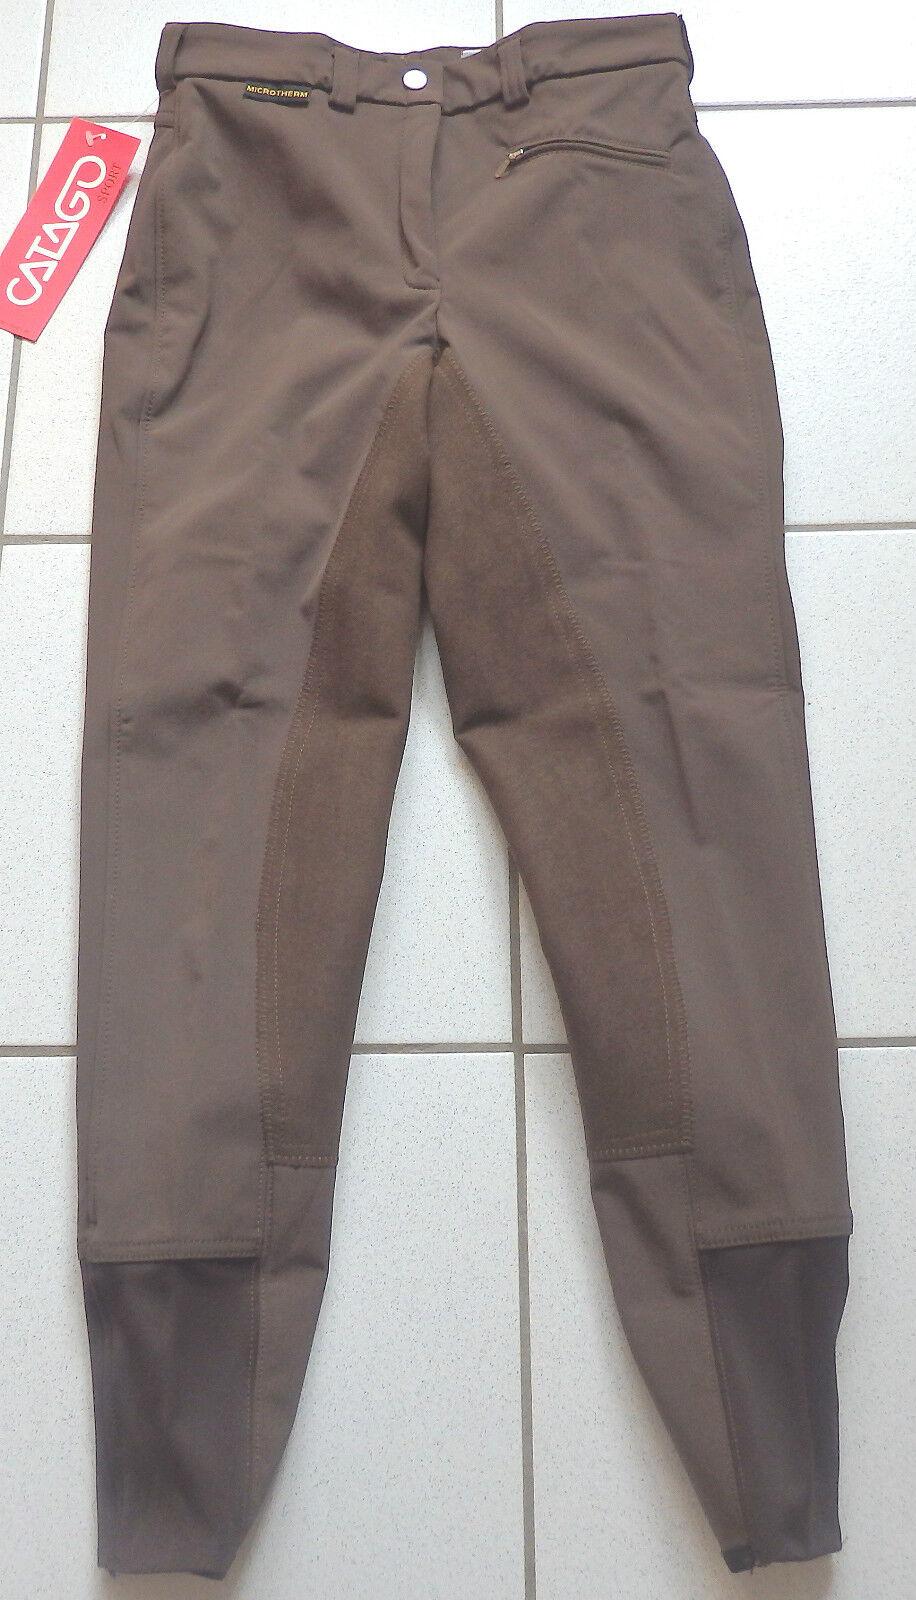 CATAGO  Softshell Kids Jodhpurs, Winter, Full Trim, Brown, Size 176 SL, (D56)  comfortably